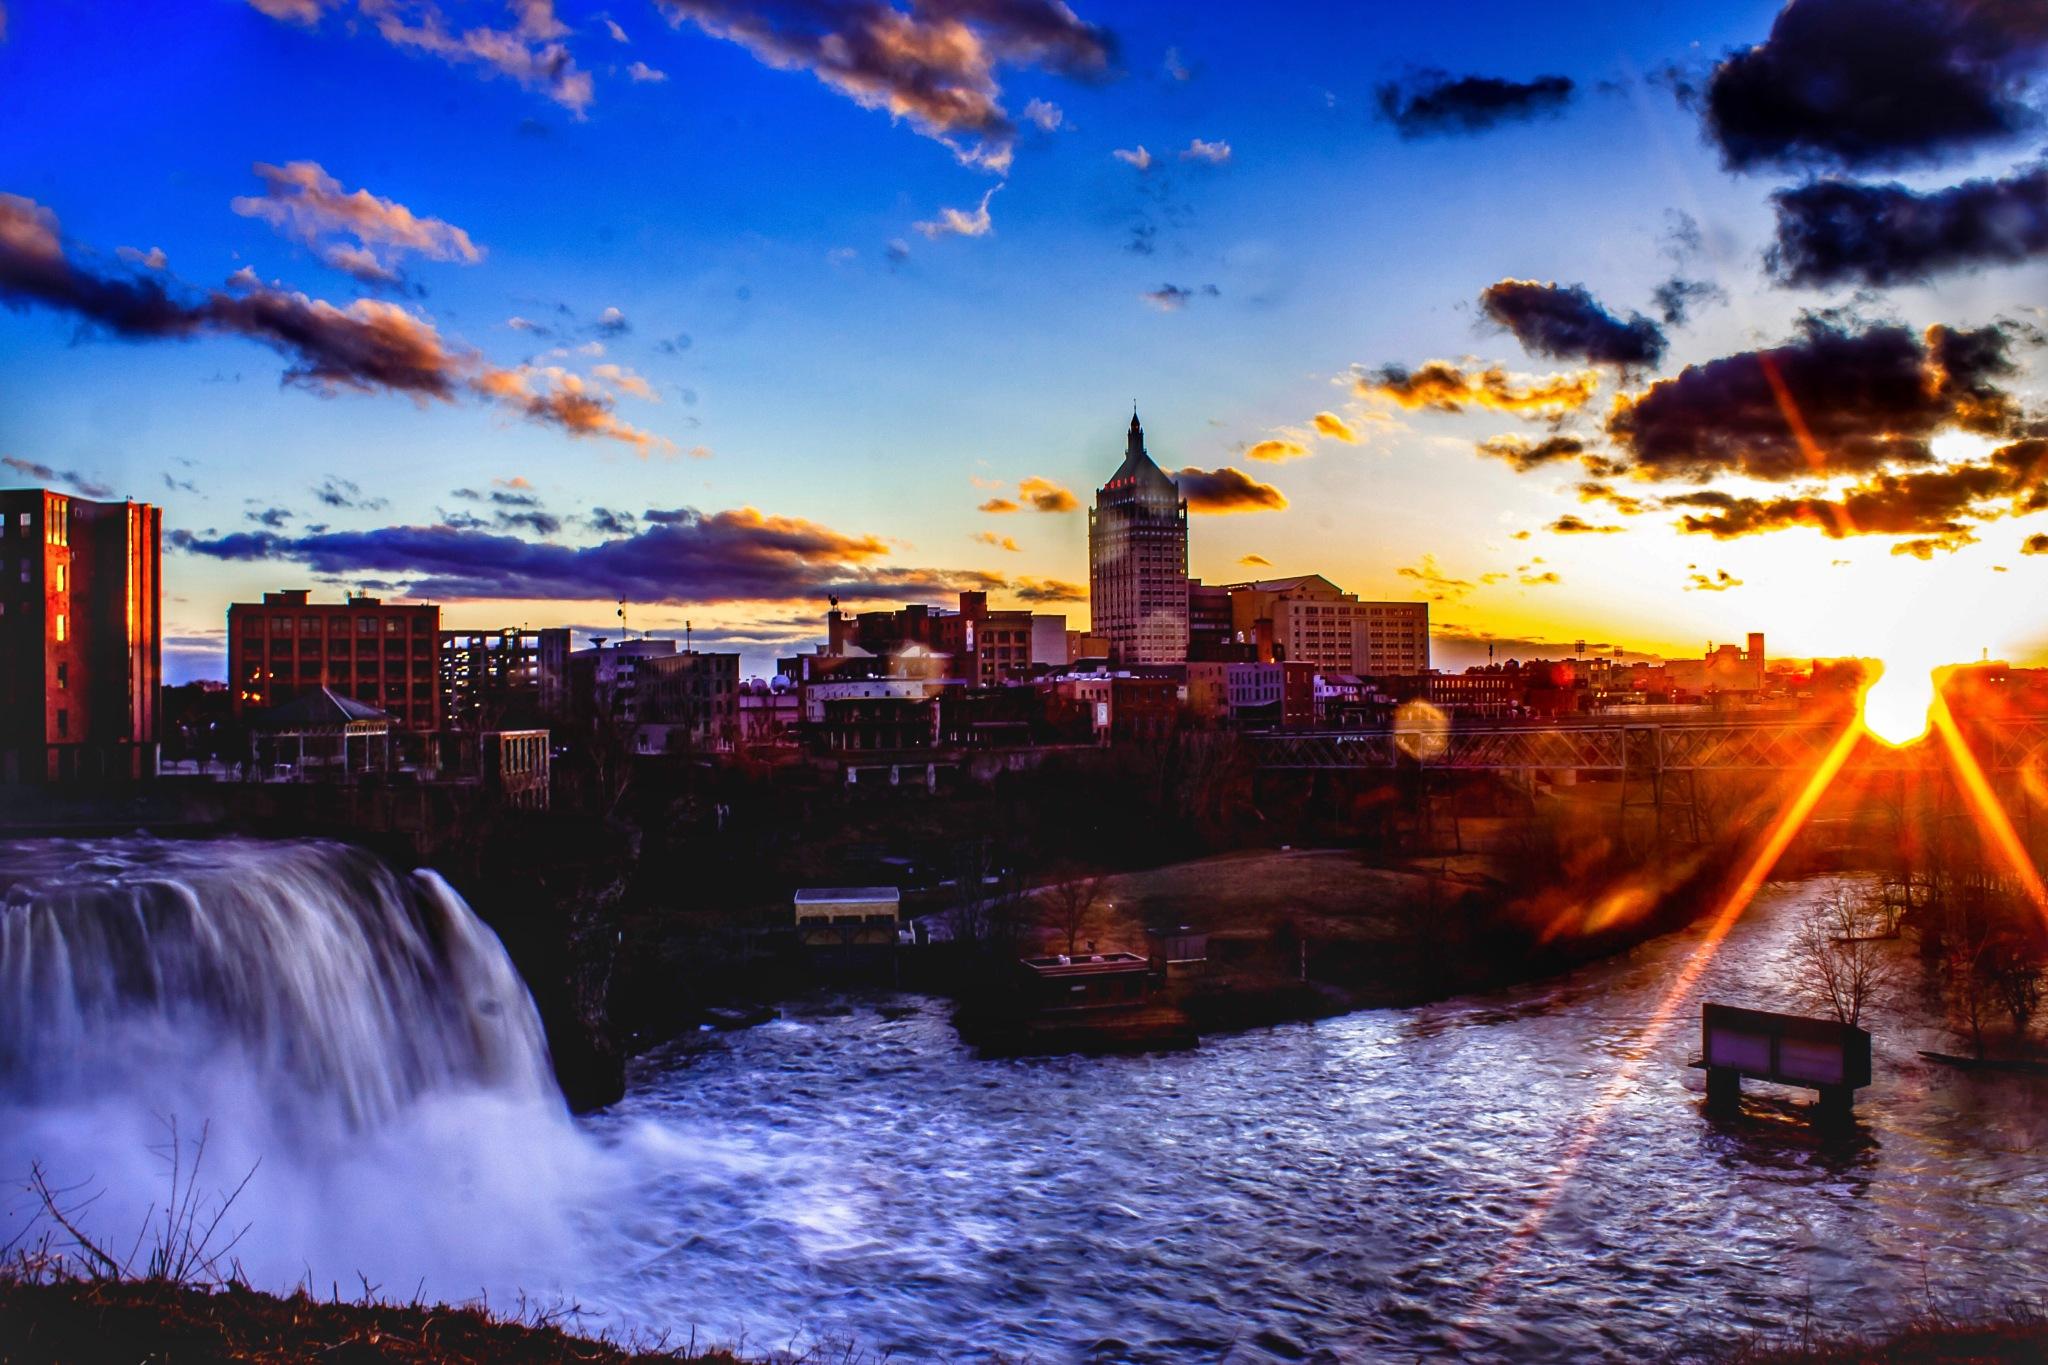 Sunset Over Rochester by Robert Eichas